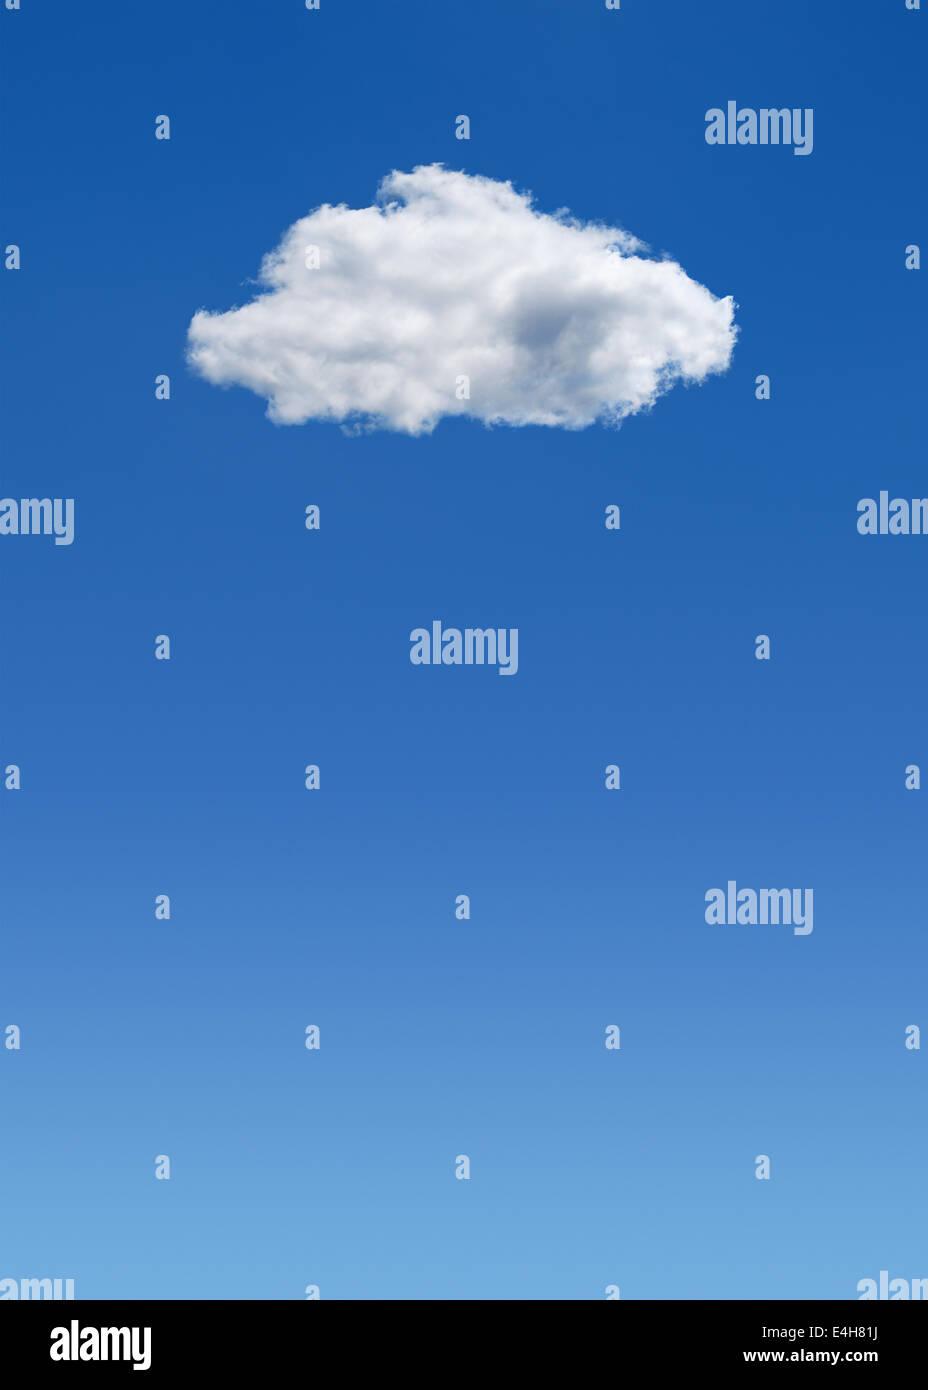 Nuvola in un cielo blu. Immagini Stock